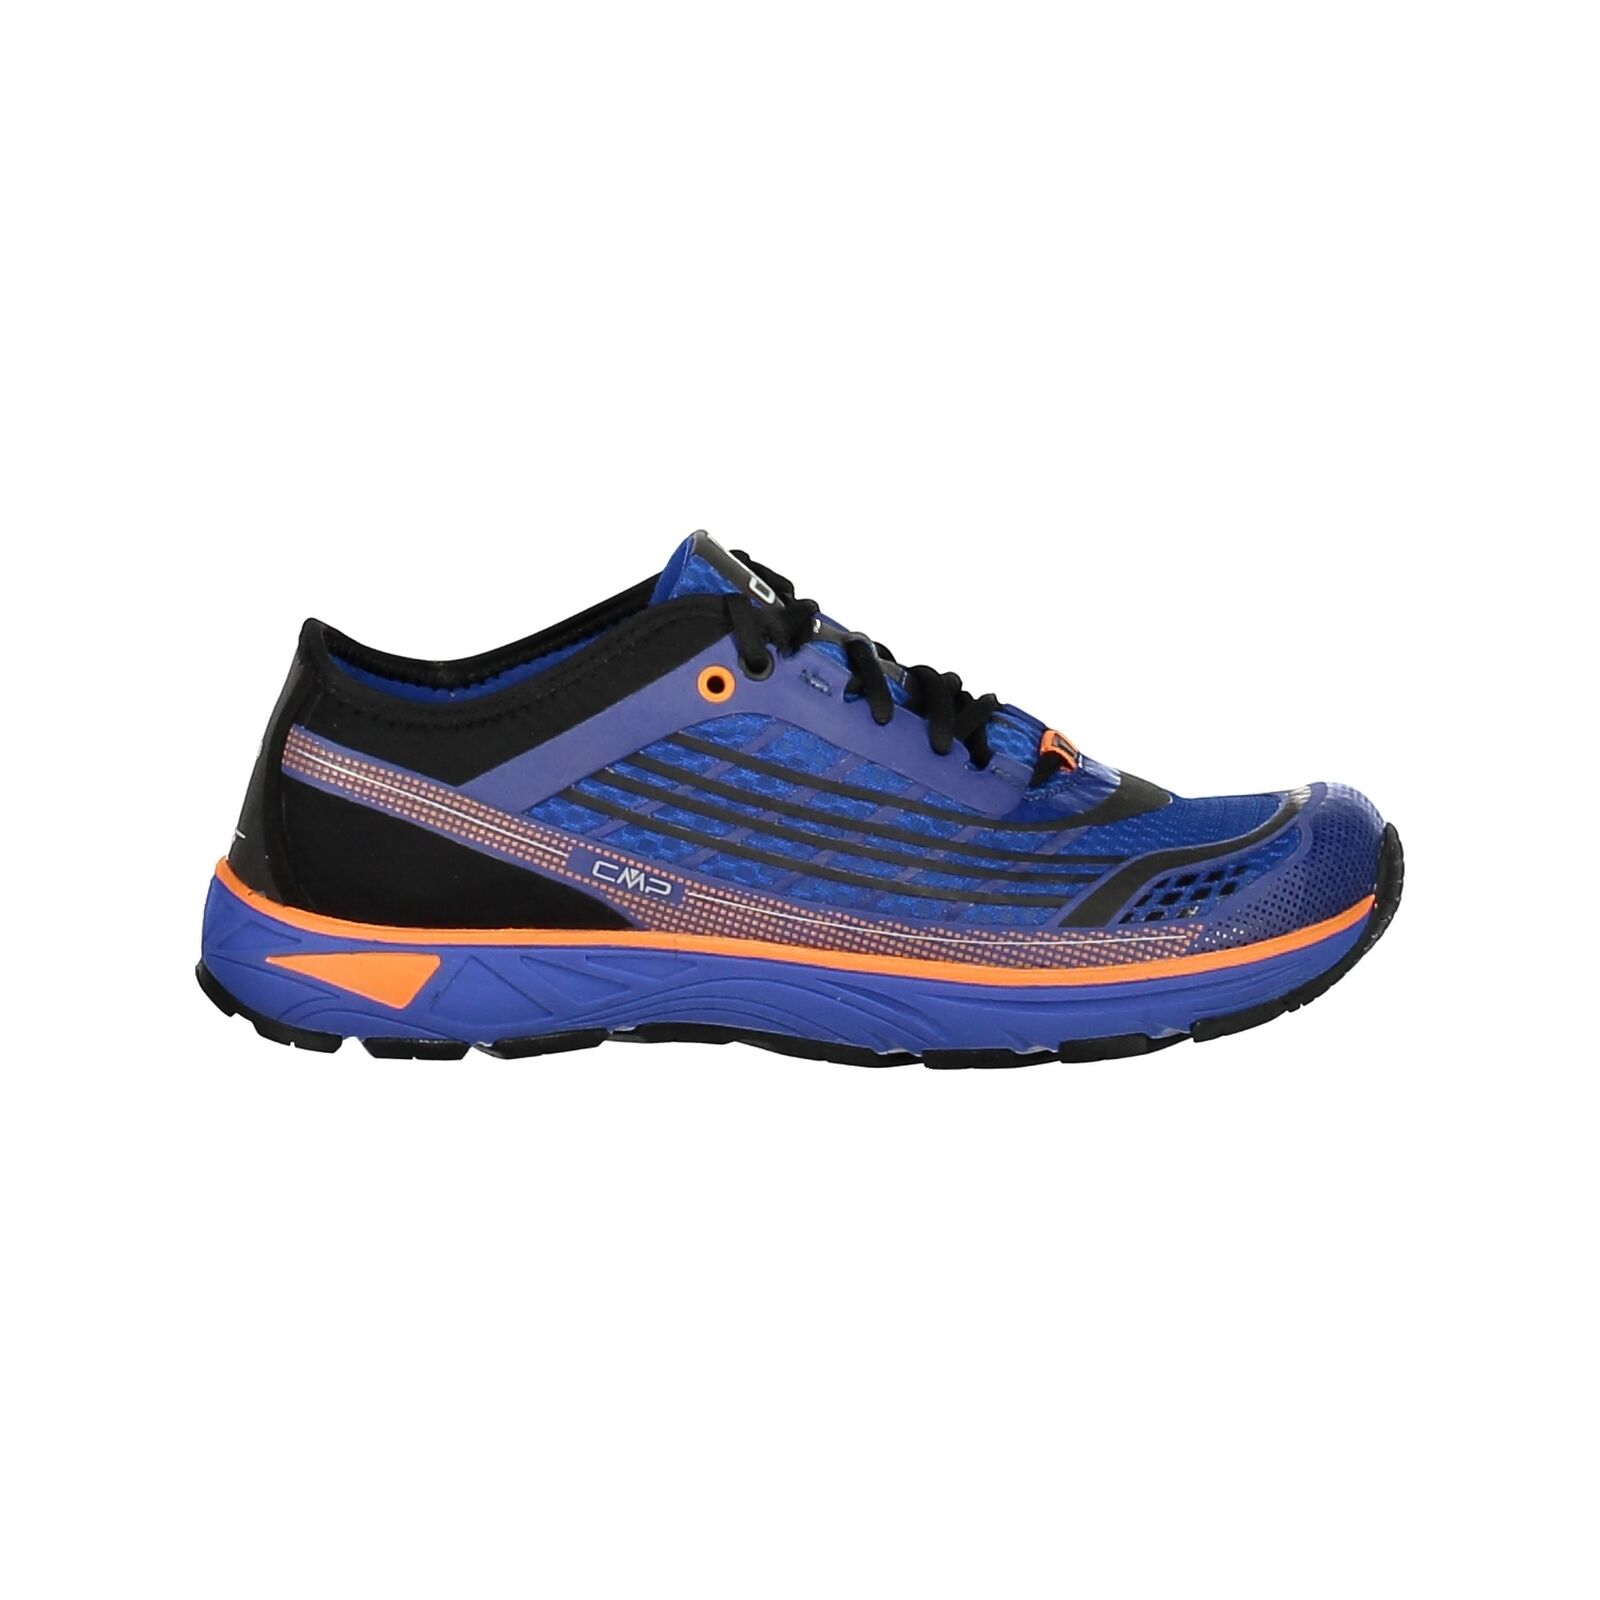 CMP shoes da Corsa Sport Libre Corsa shoes bluee Pianura   online cheap